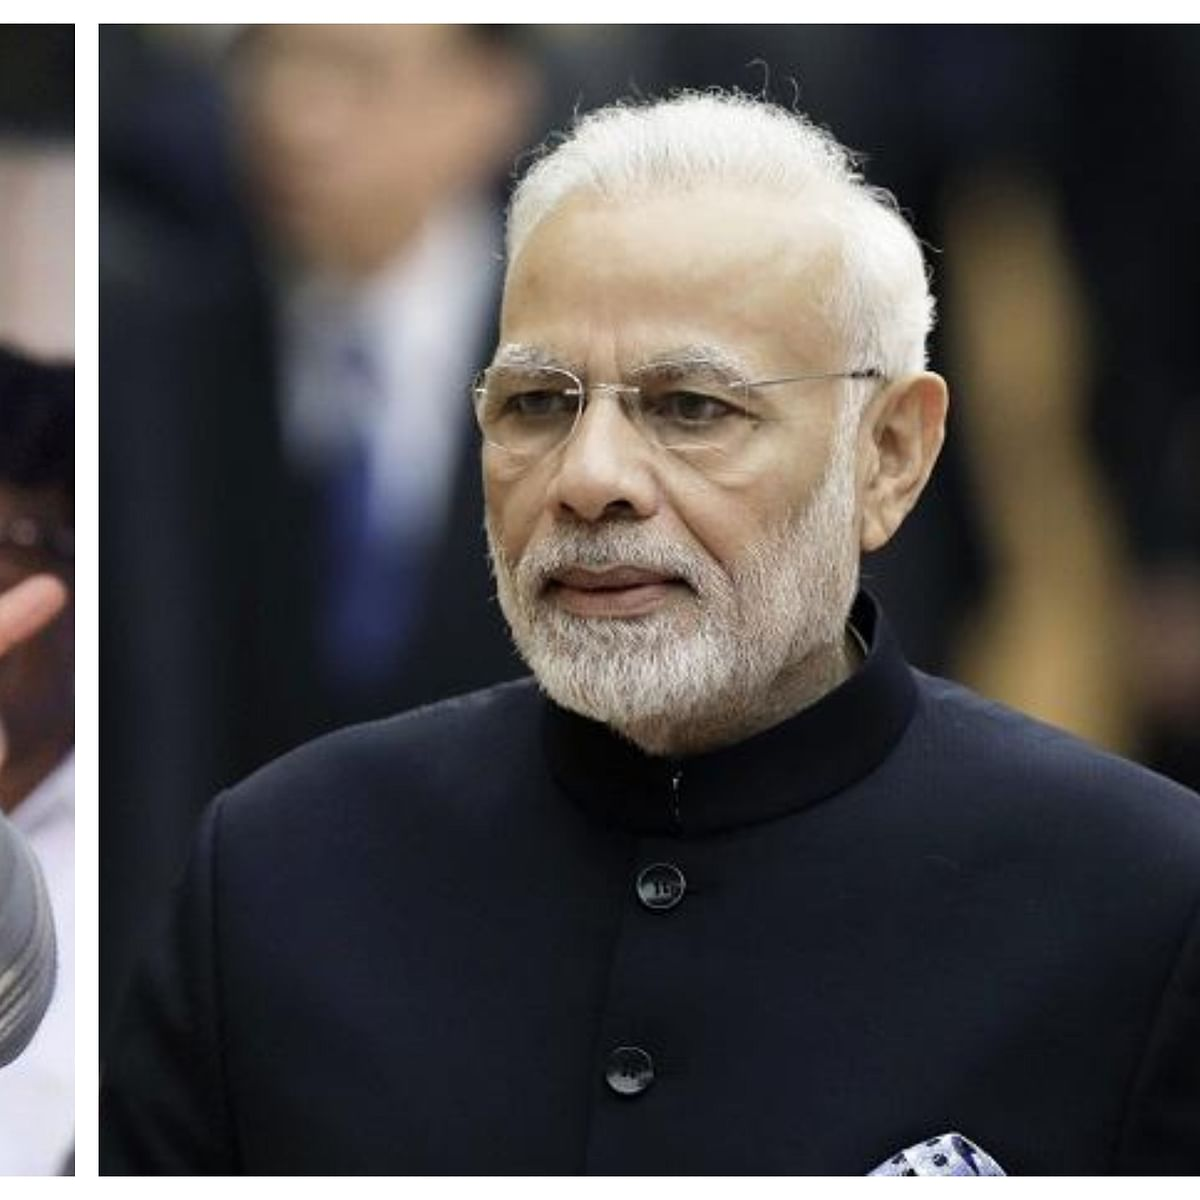 Kamal Haasan criticises PM Modi's lockdown decision in open letter